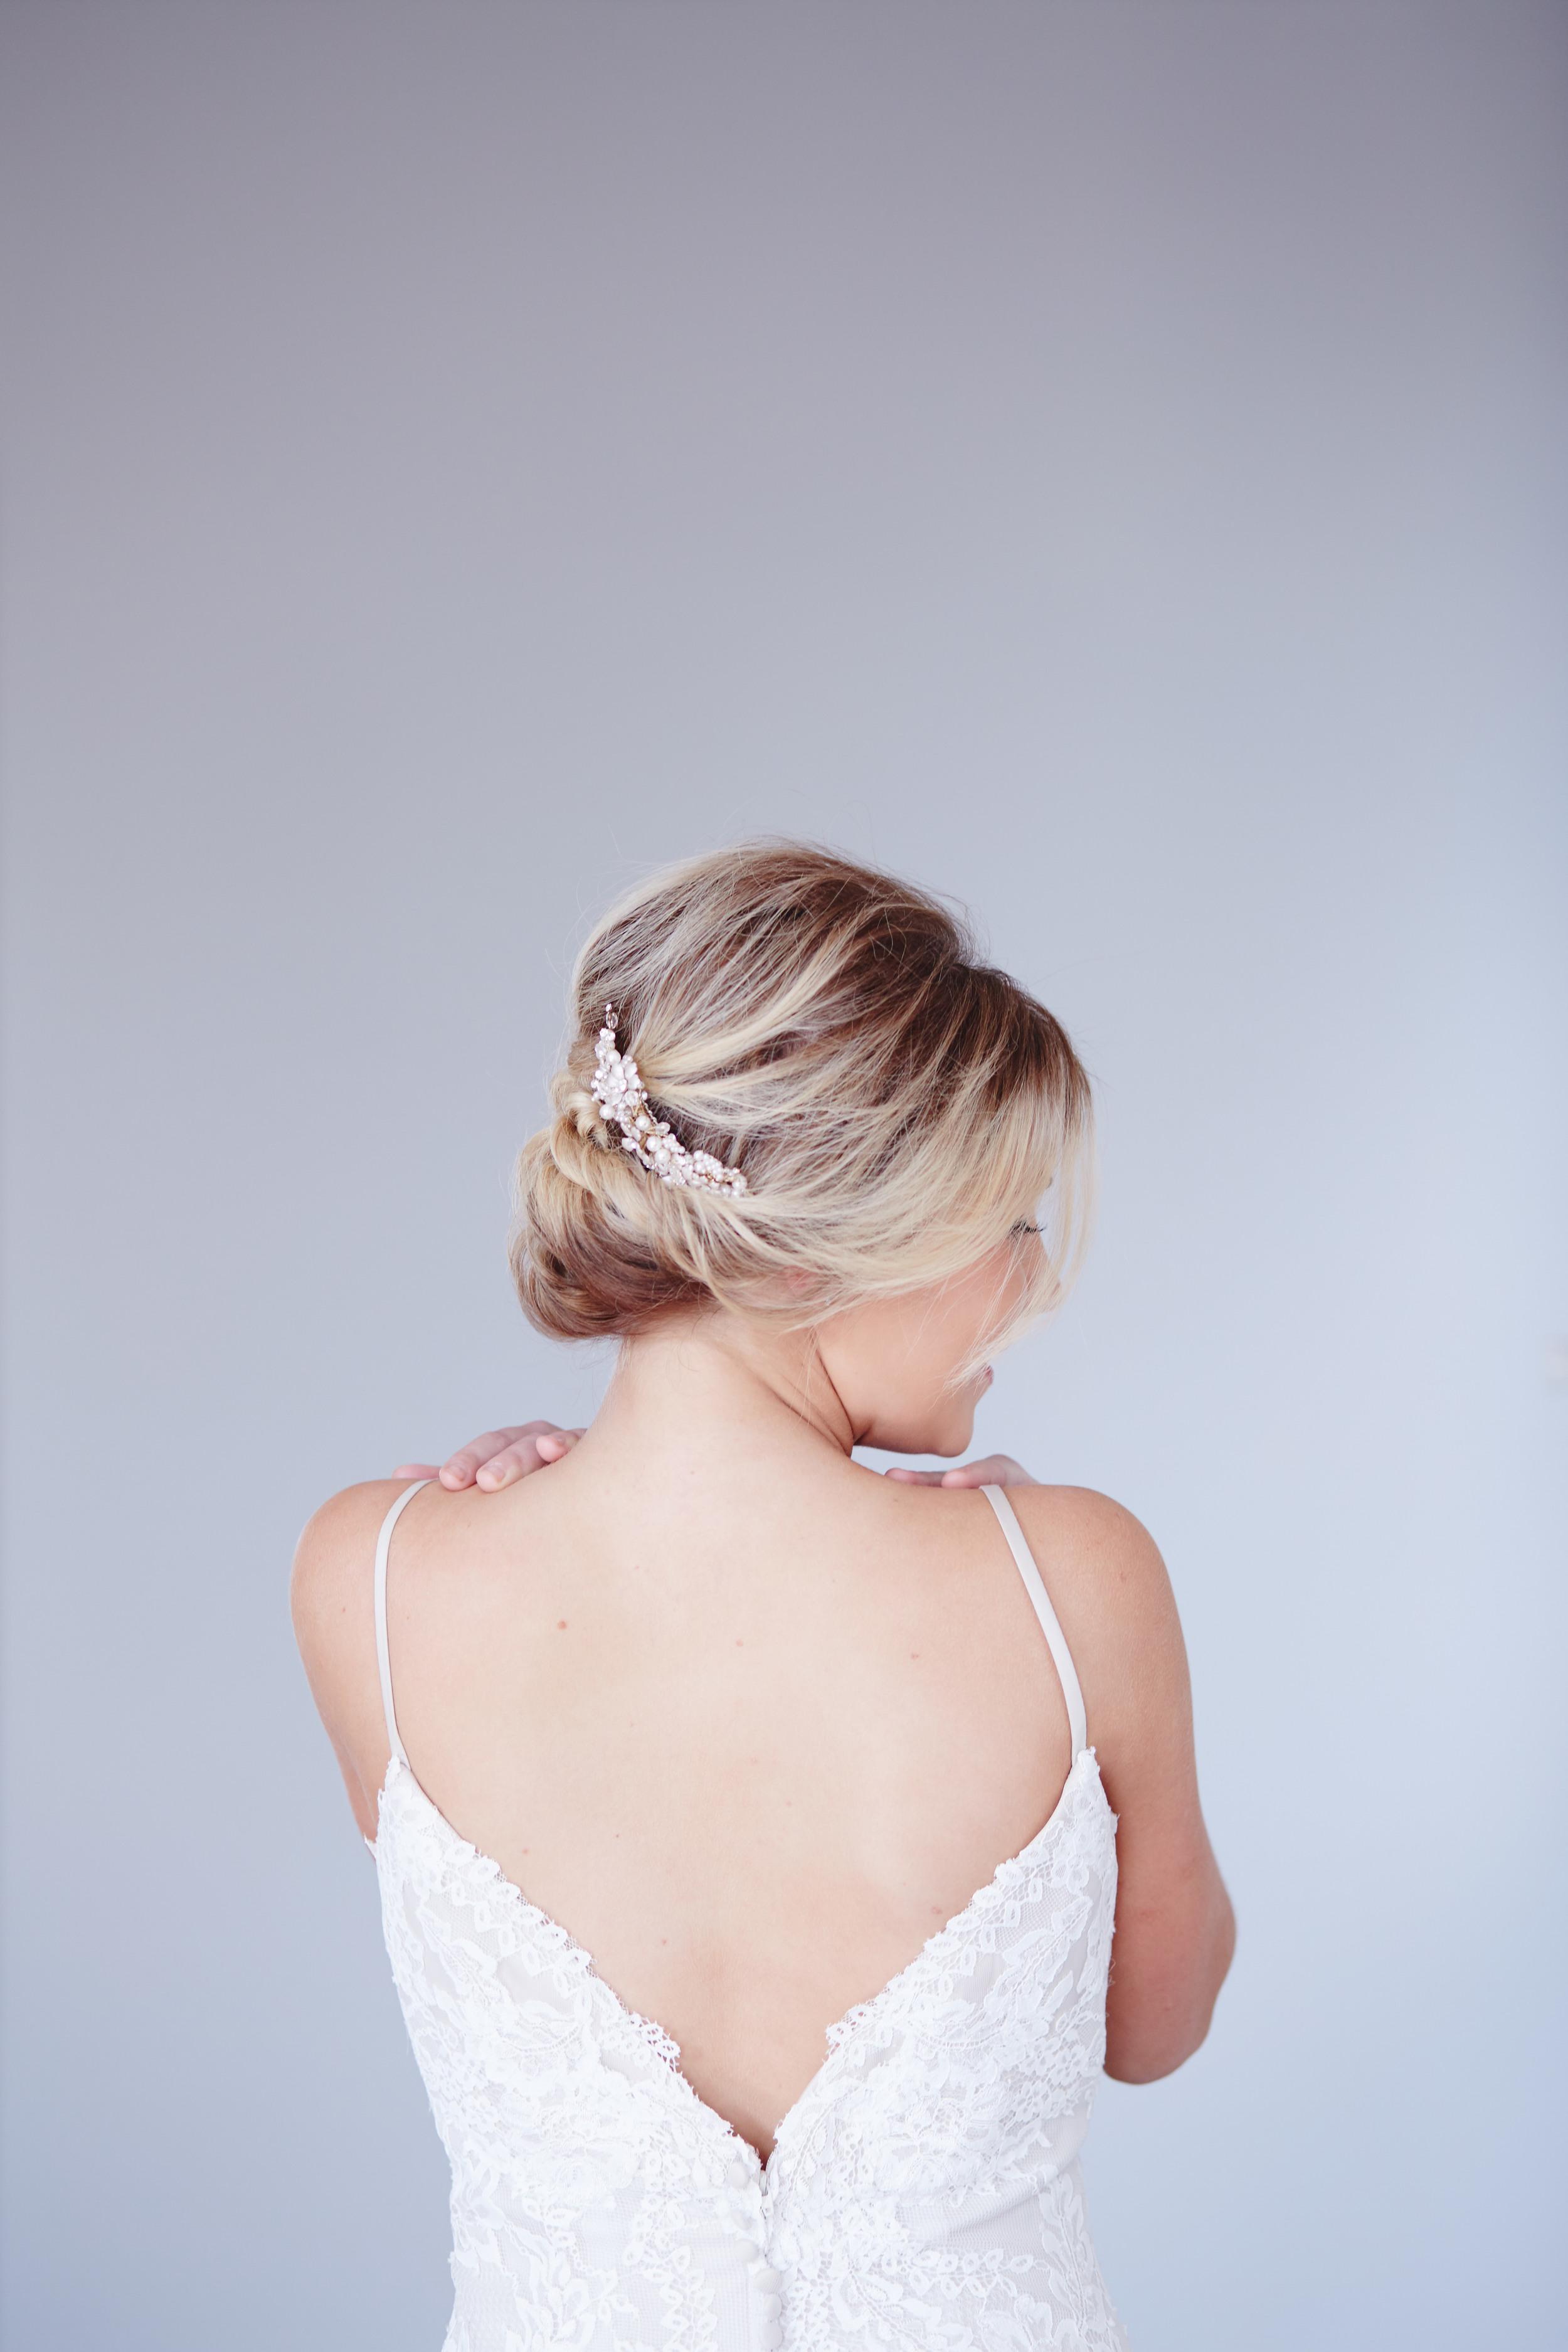 Styled_Session_Becca_Bridal_Portraits_Sarah_Tau_Photography_HOB_Studio_285 26.jpg